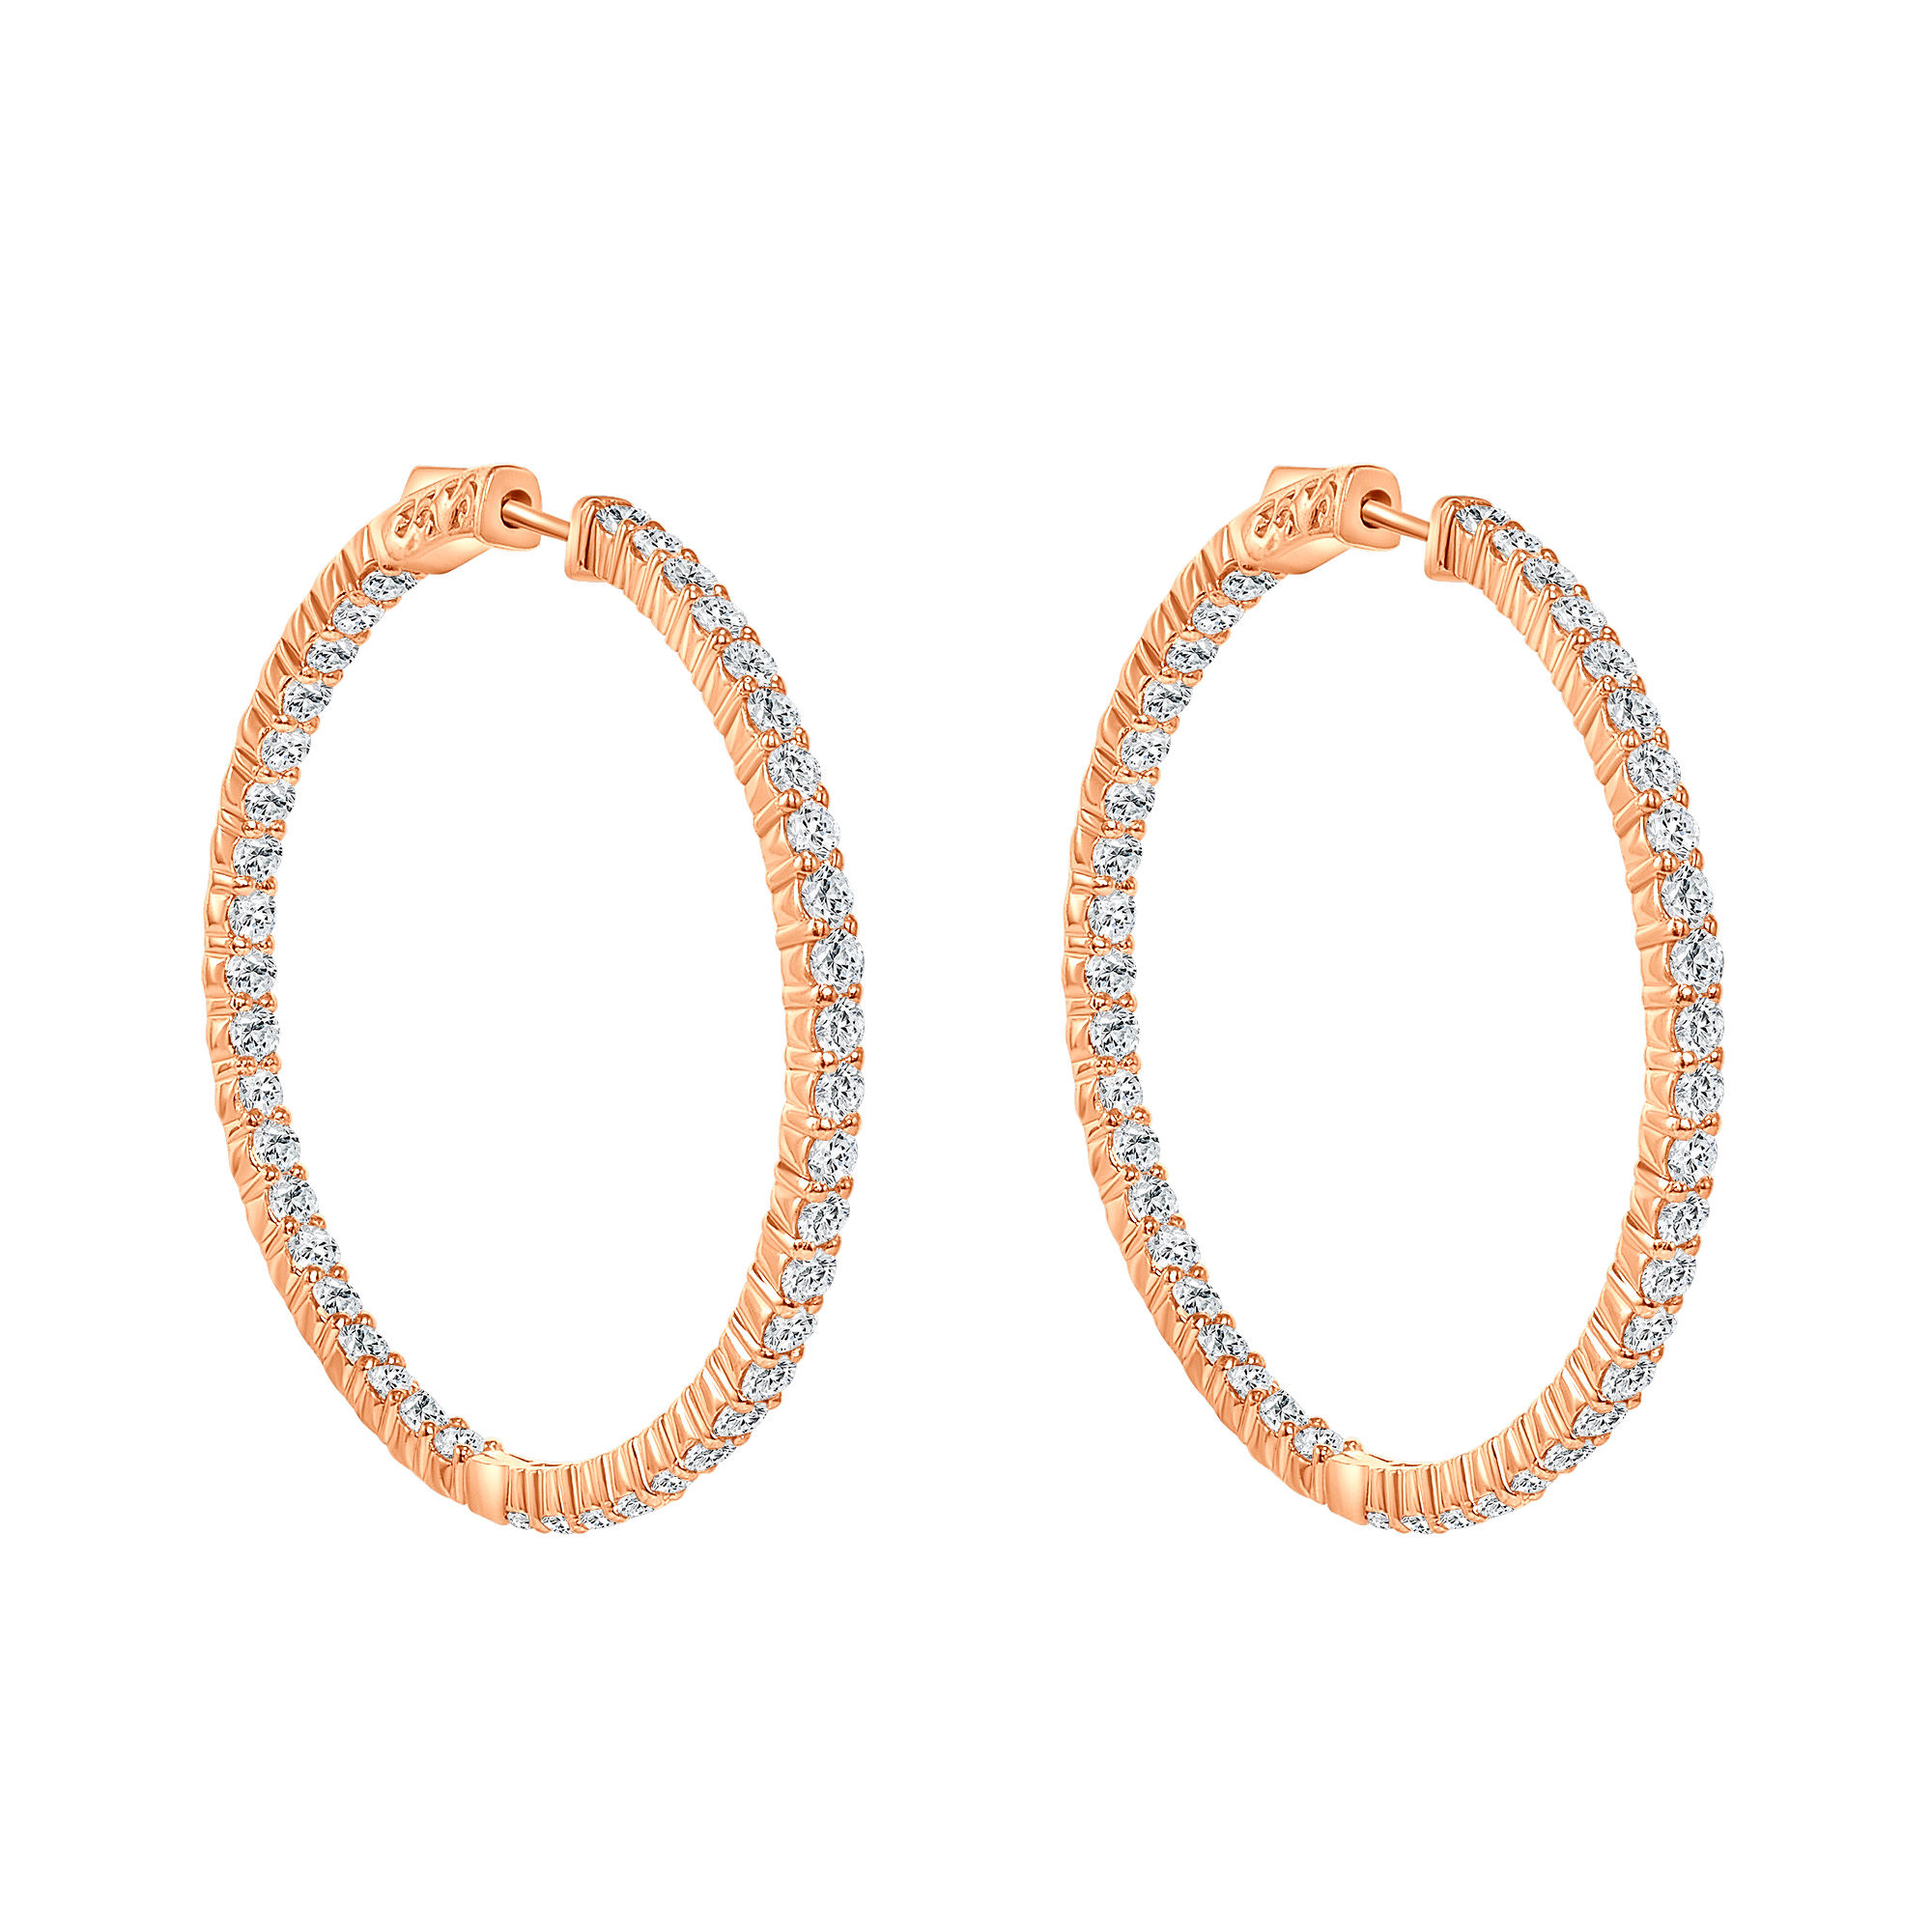 14k yellow gold diamond hoop earrings | 14k gold hoop earrings